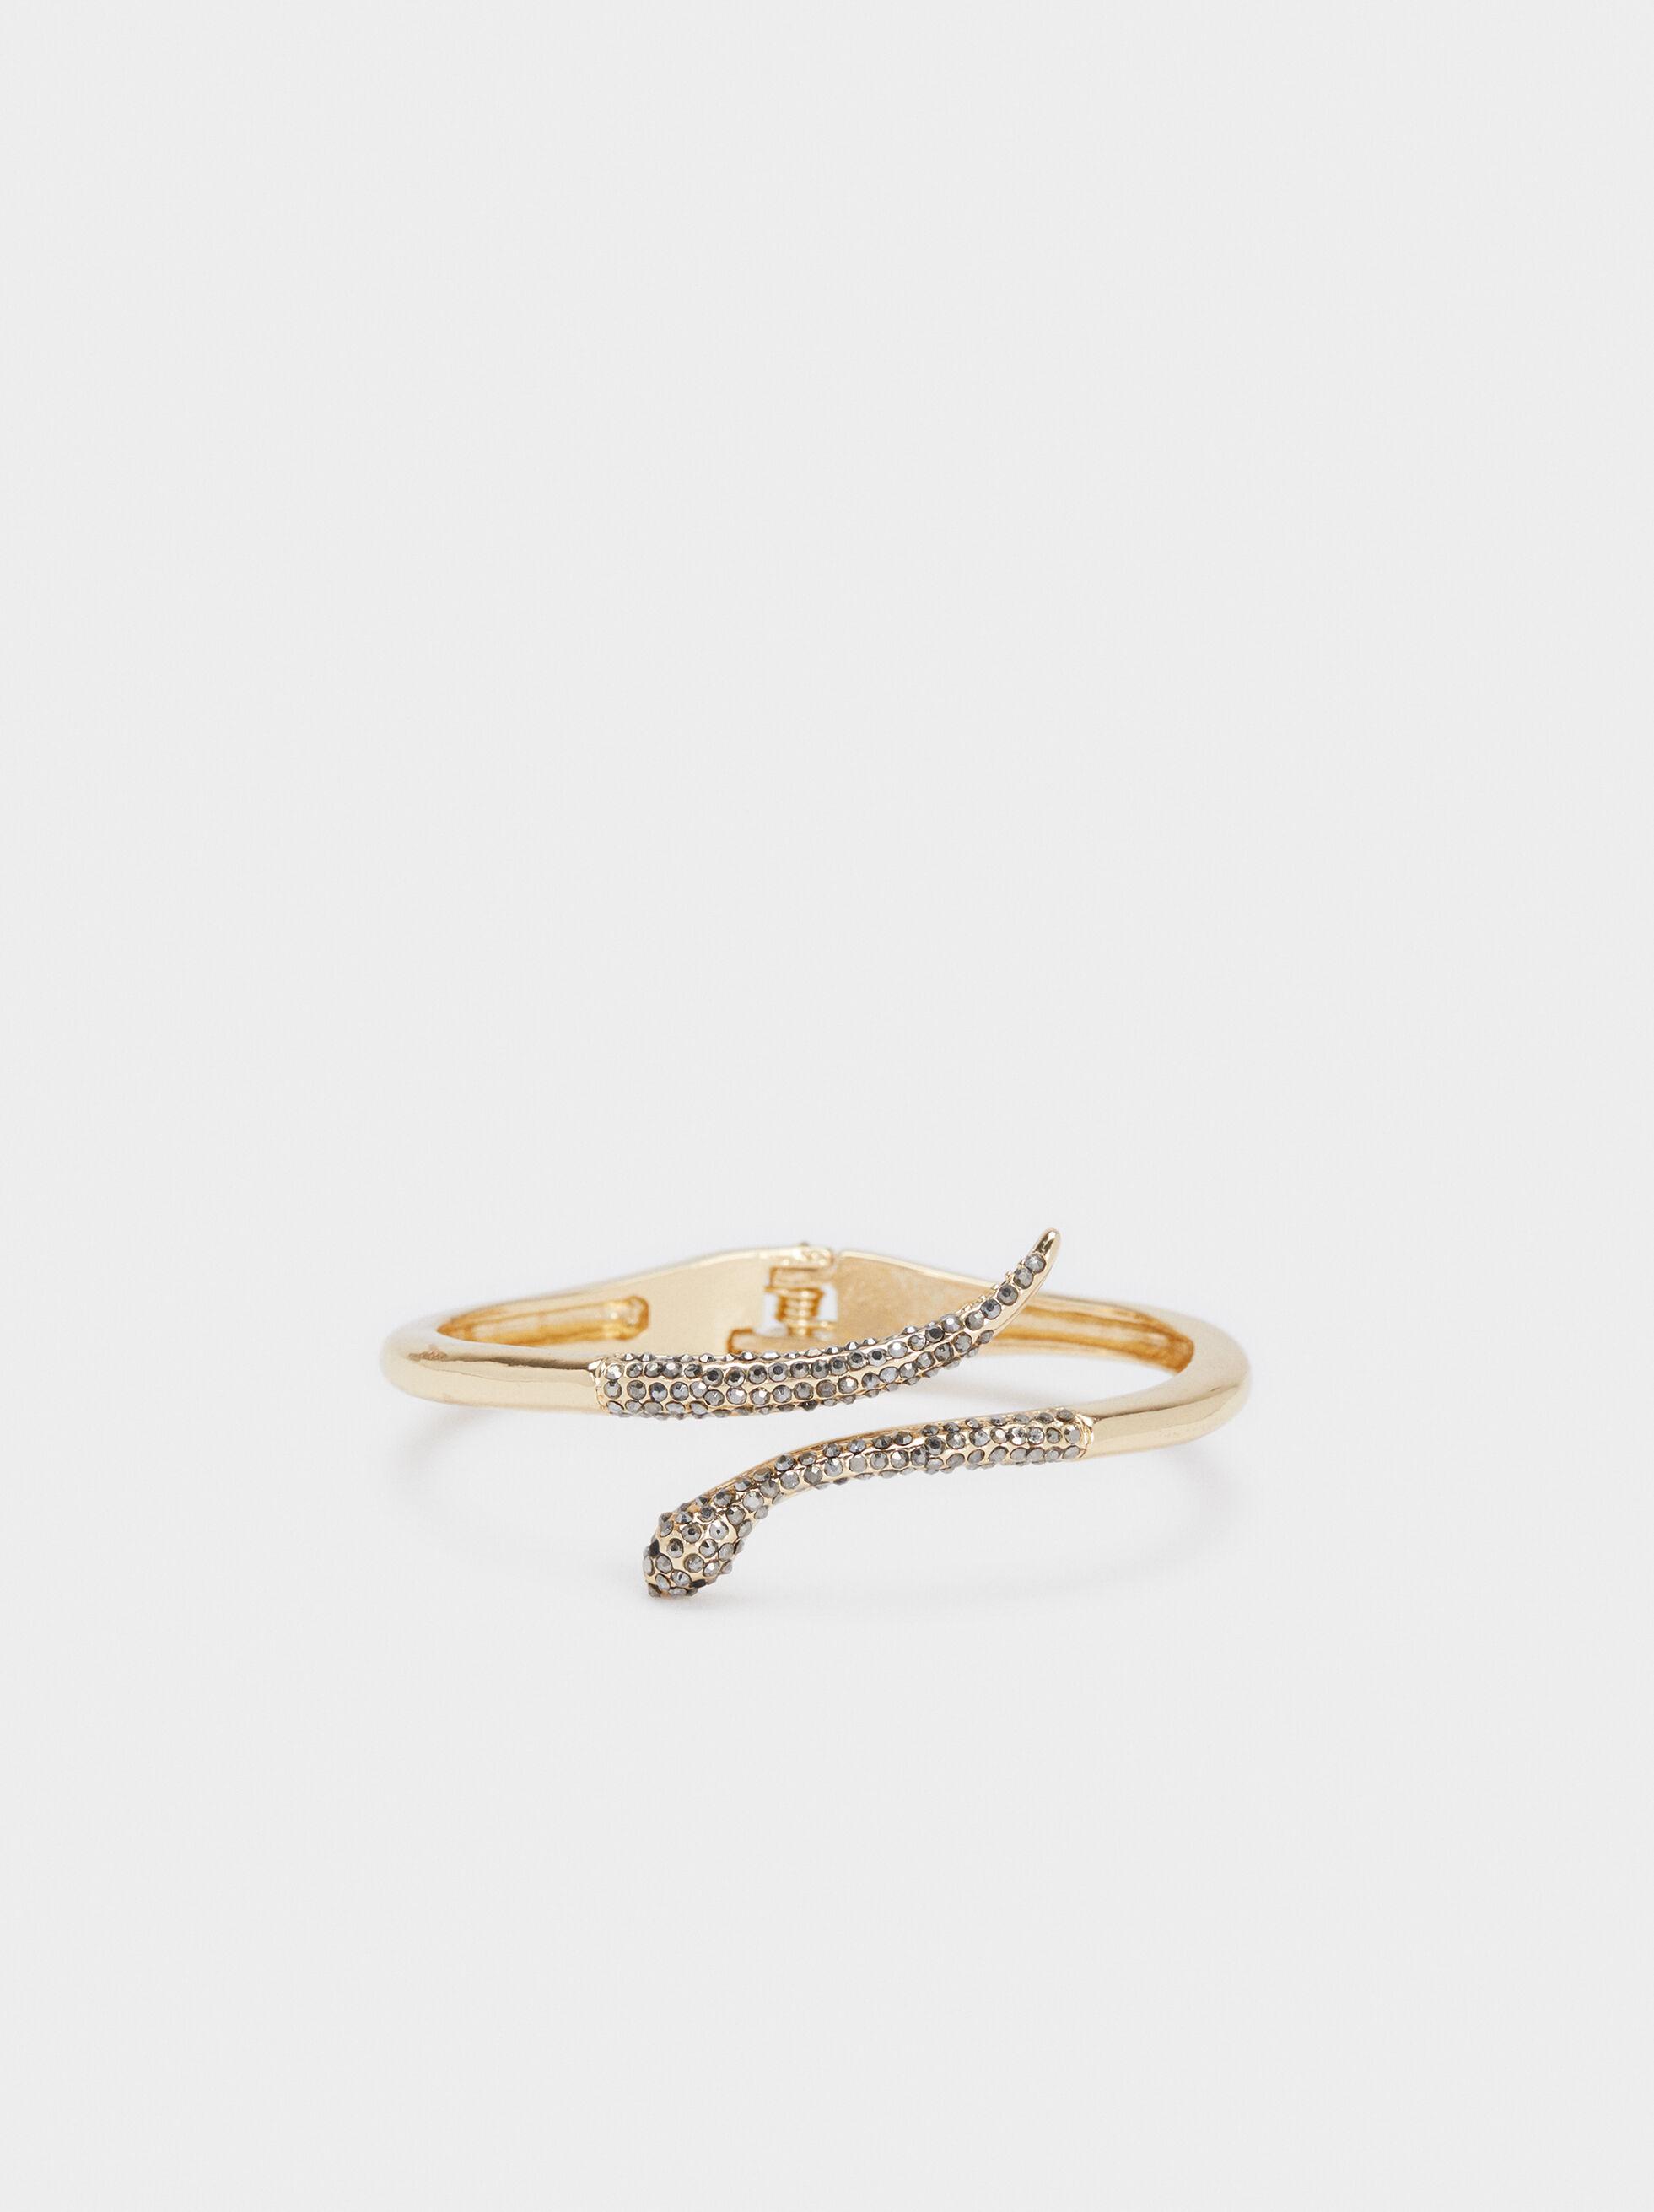 Bracelet En Métal Doré Rigide, Doré, hi-res